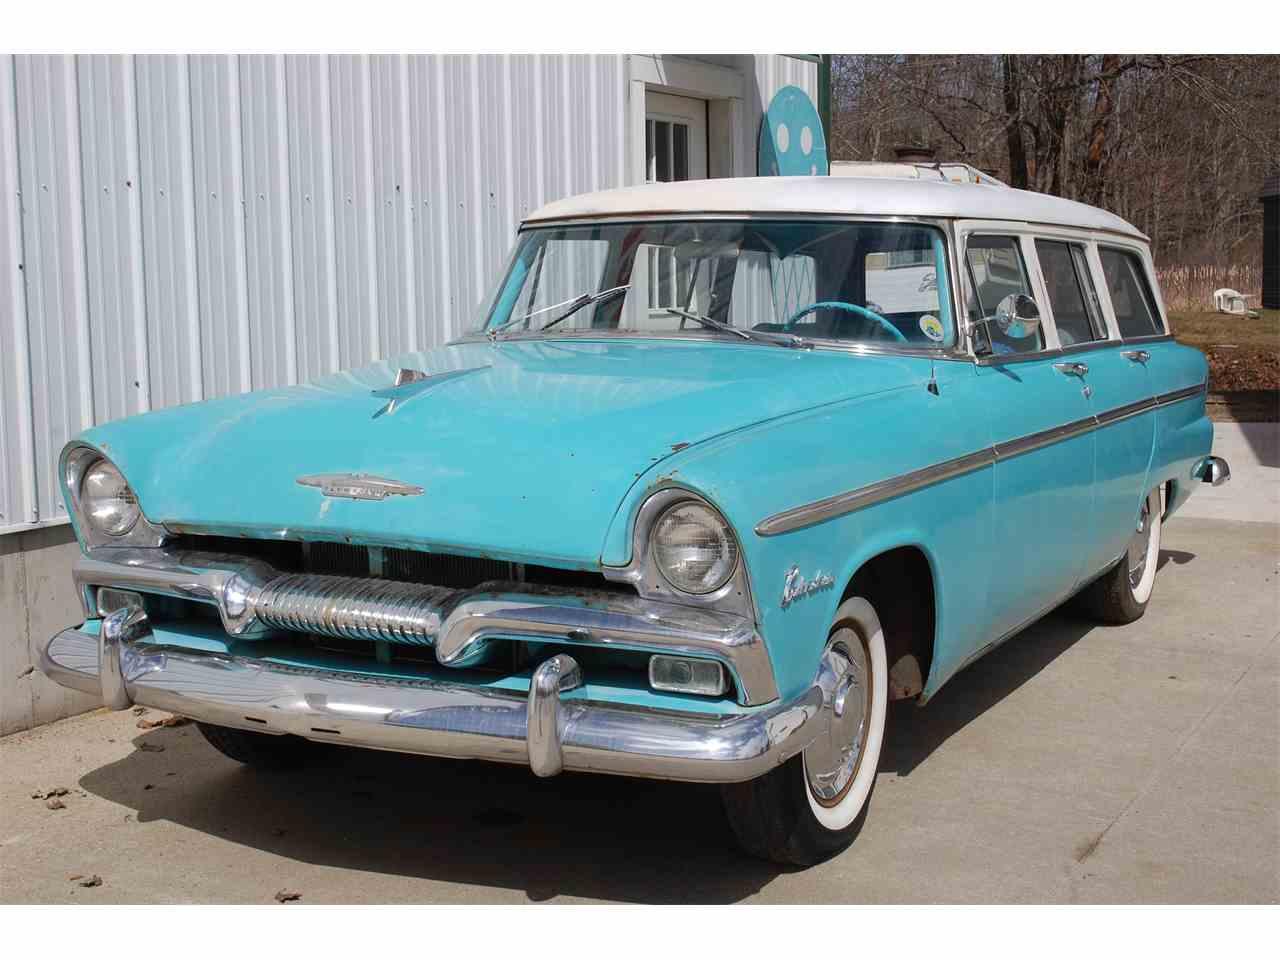 1956 Plymouth Suburban for Sale | ClassicCars.com | CC-975022